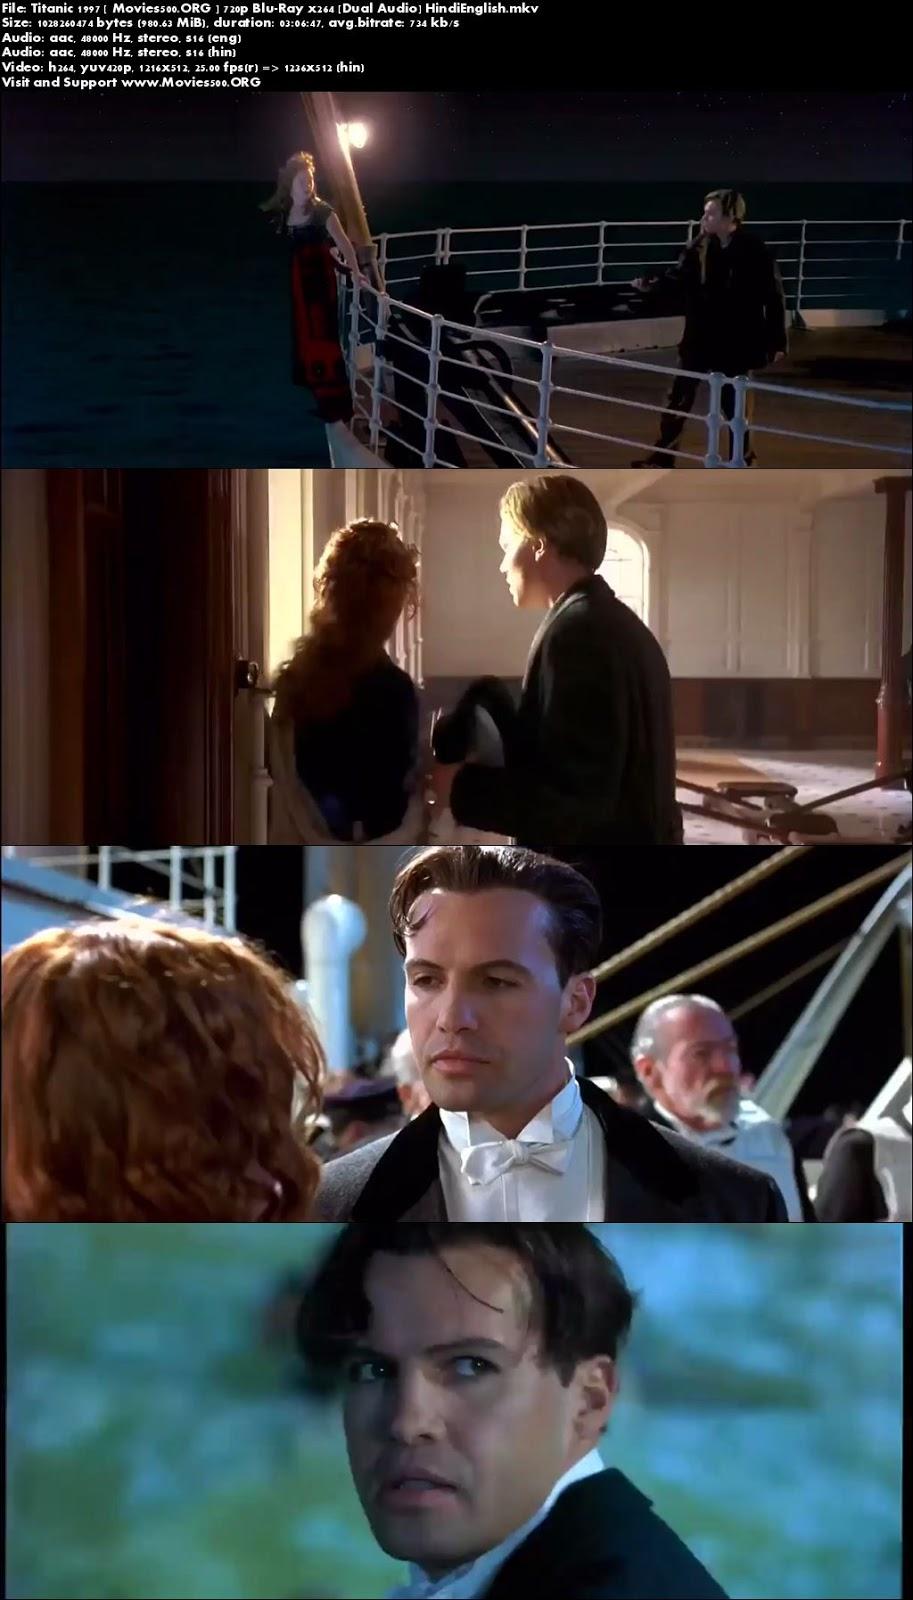 Titanic 1997 Dual Audio Hindi Movie Download BluRay at sweac.org